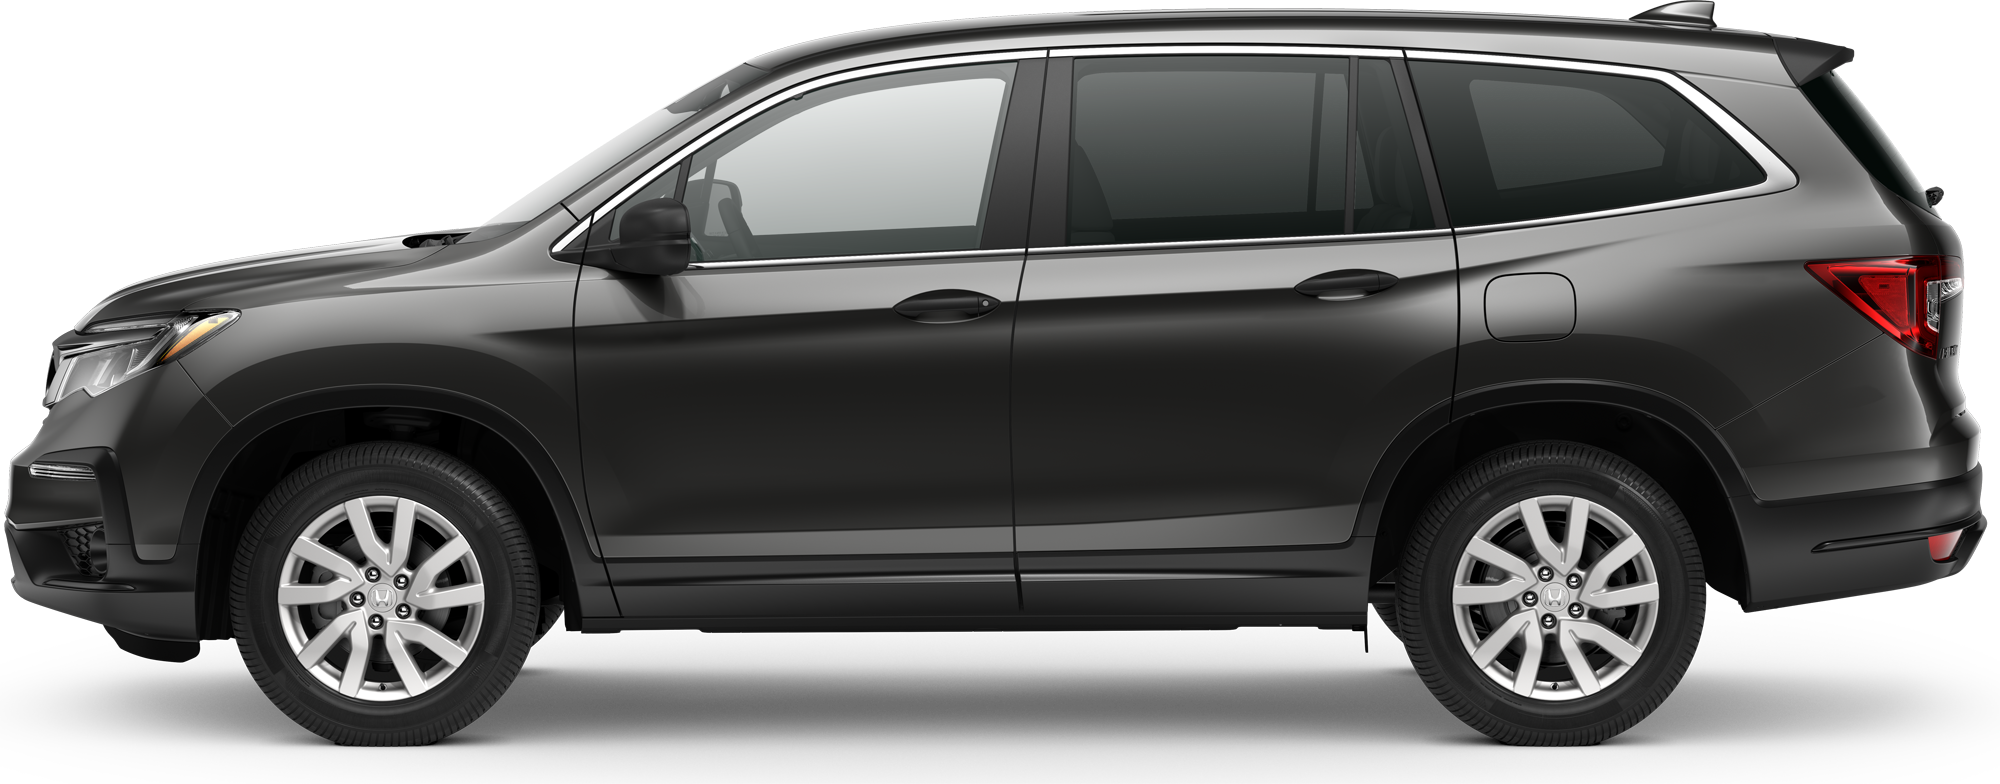 2022 Honda Pilot SUV EX-L Navi